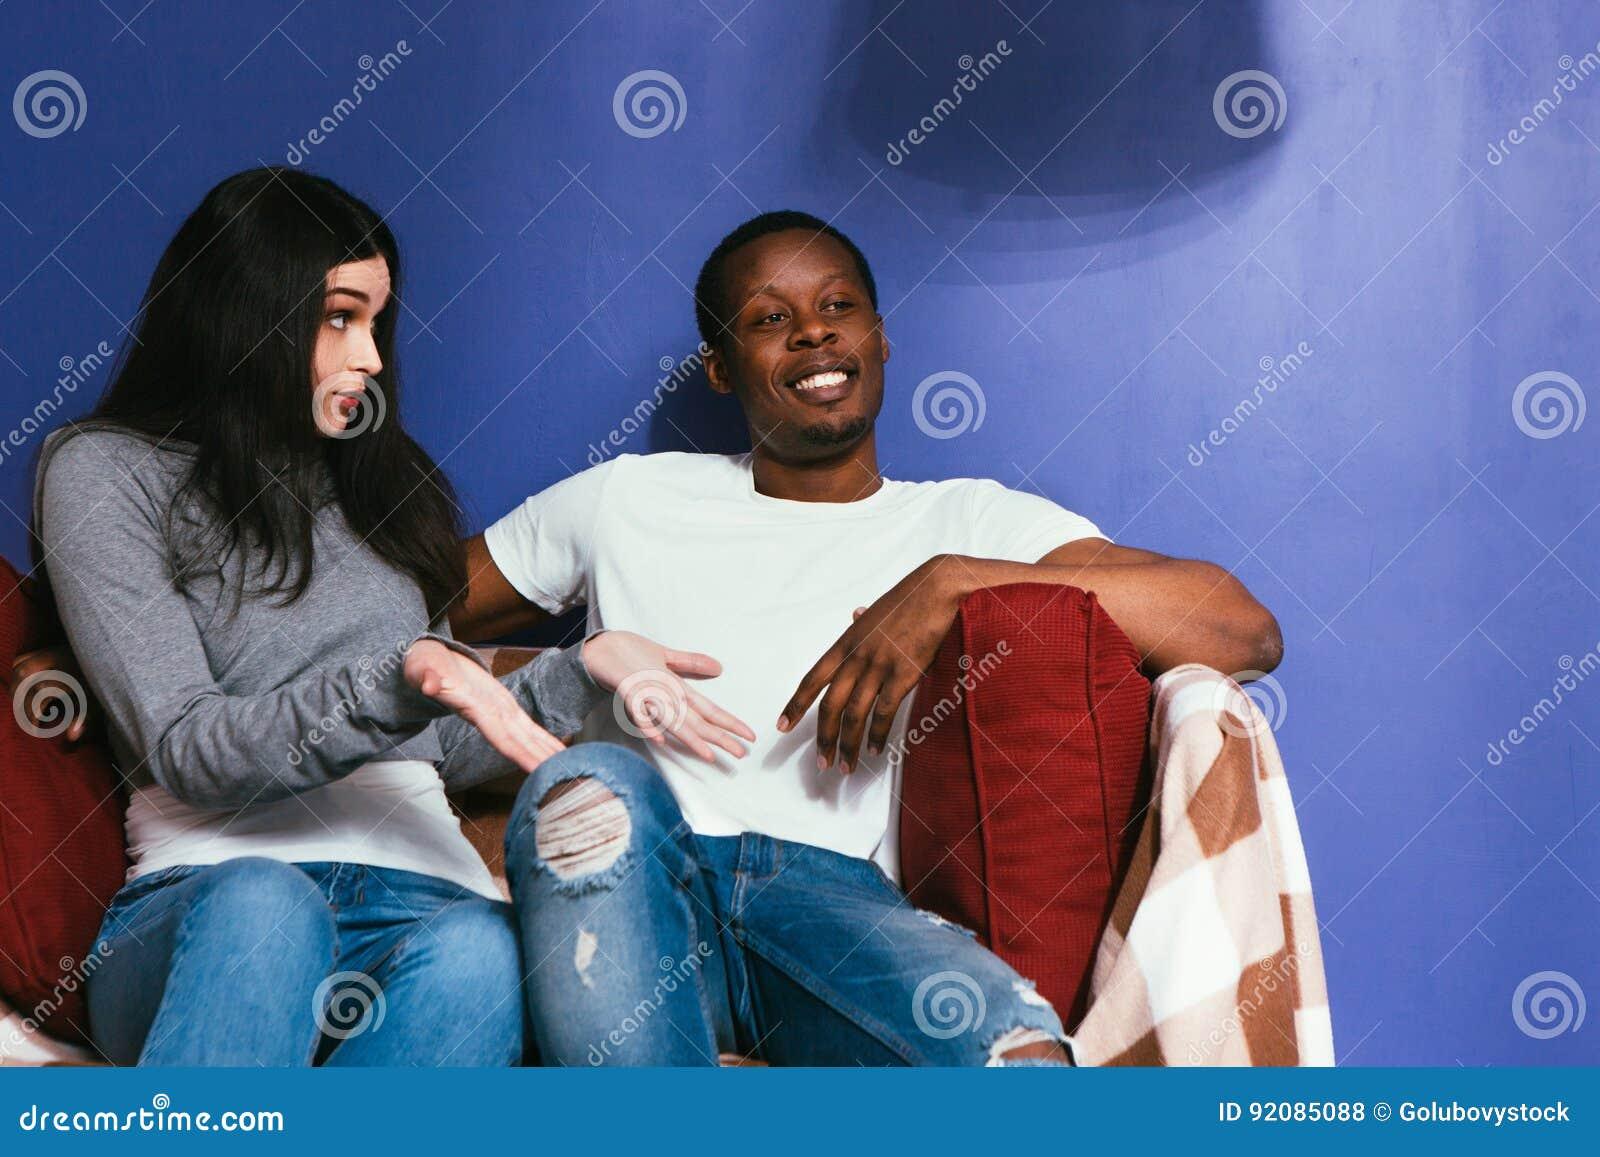 minuscule adolescent filles ayant sexe